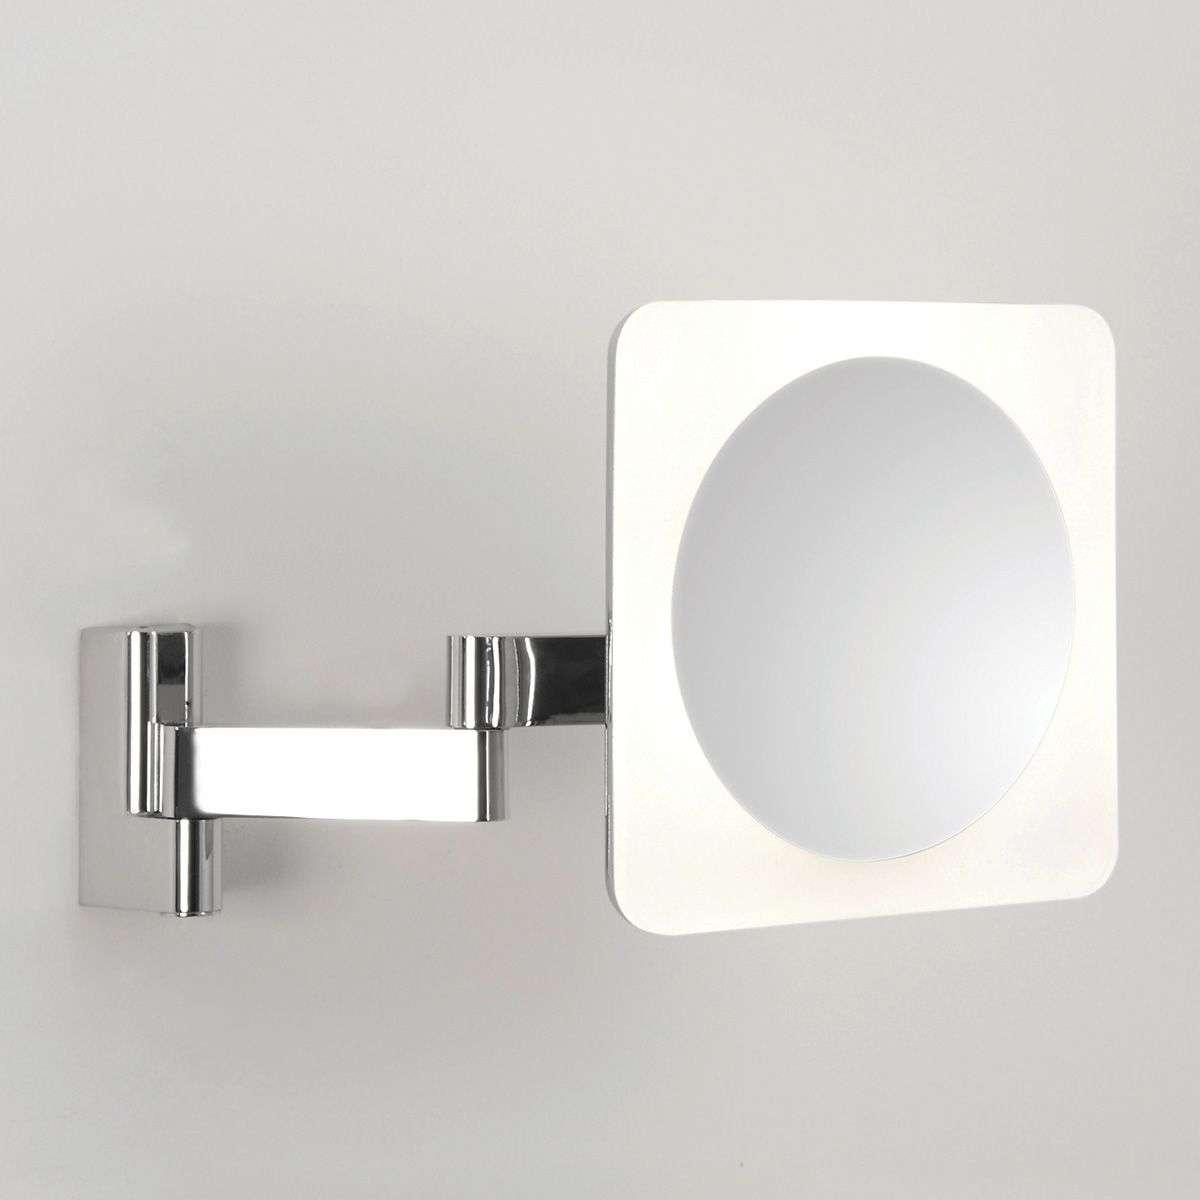 Niimi Square LED Mirror 5x Magnification-1020377-33